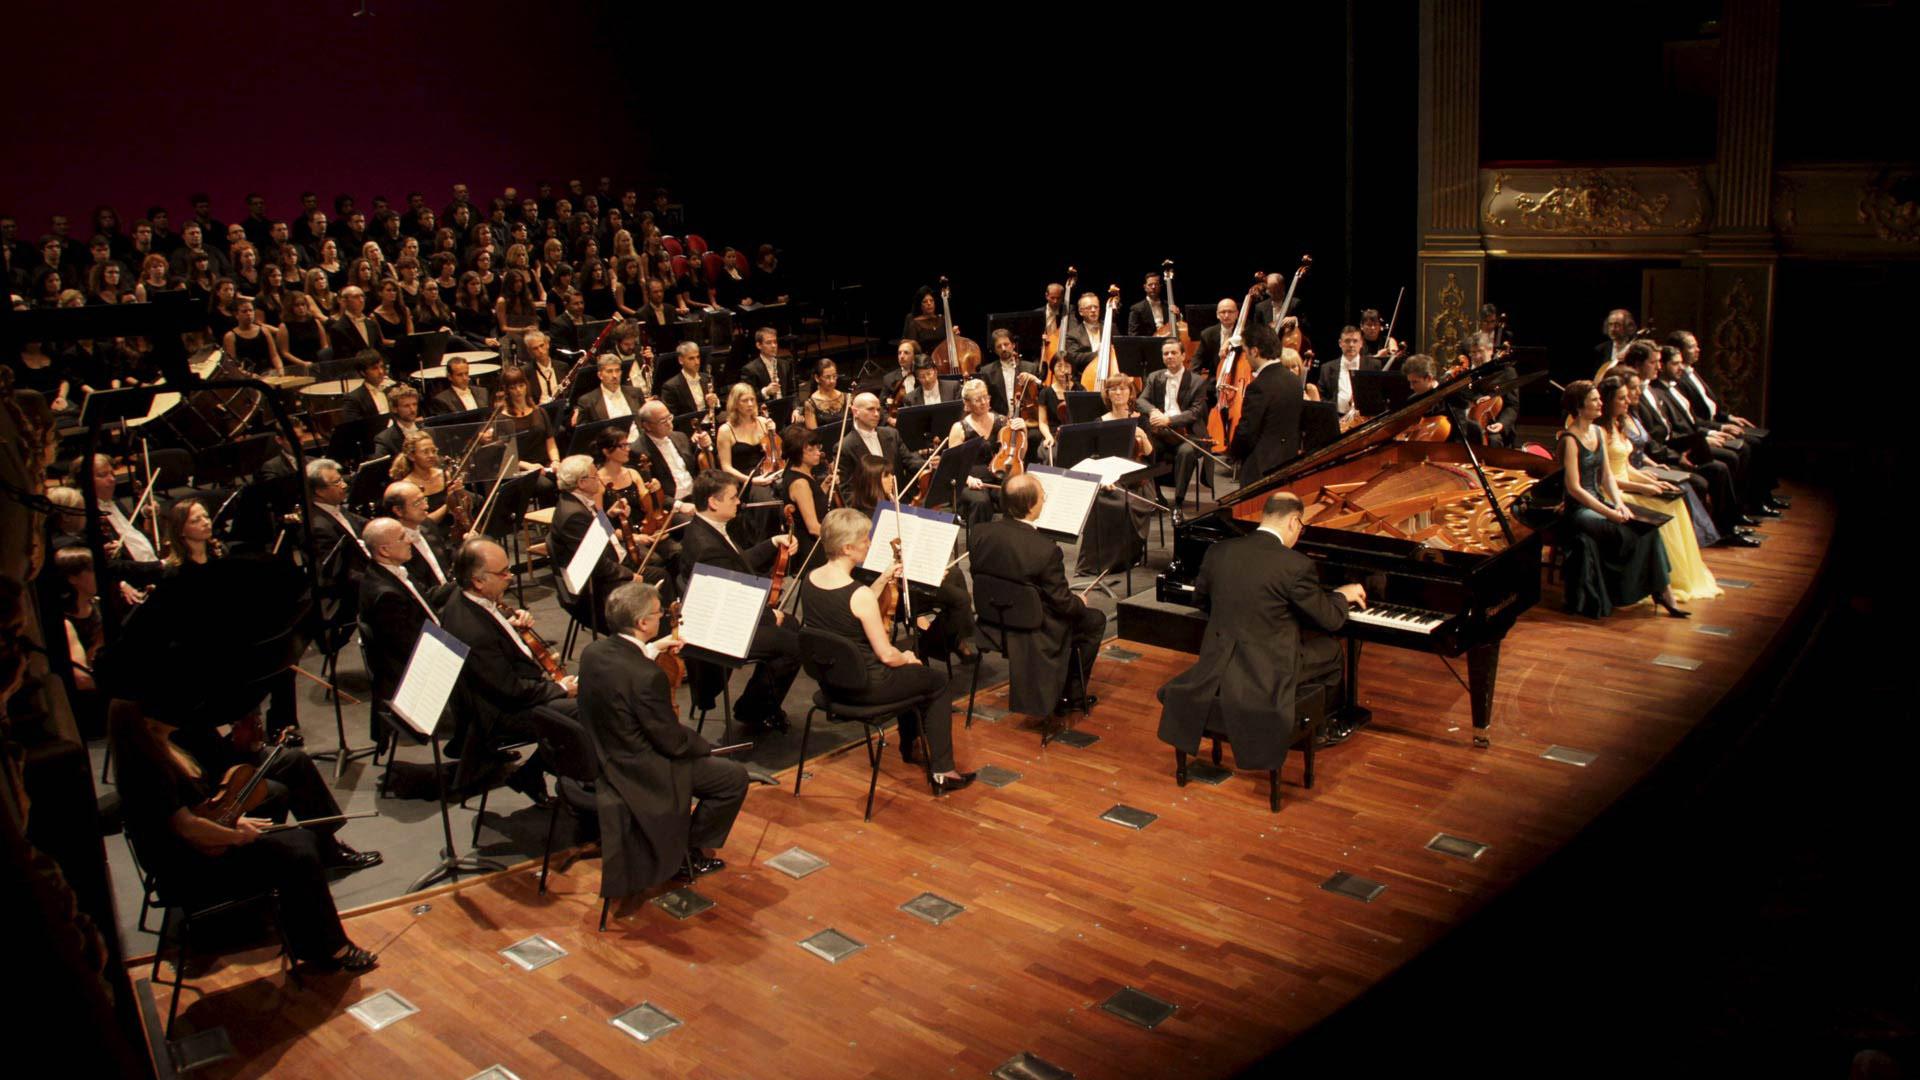 Imagen  Asiste a la Temporada de Música de Cámara Orquesta Sinfónica de Balear